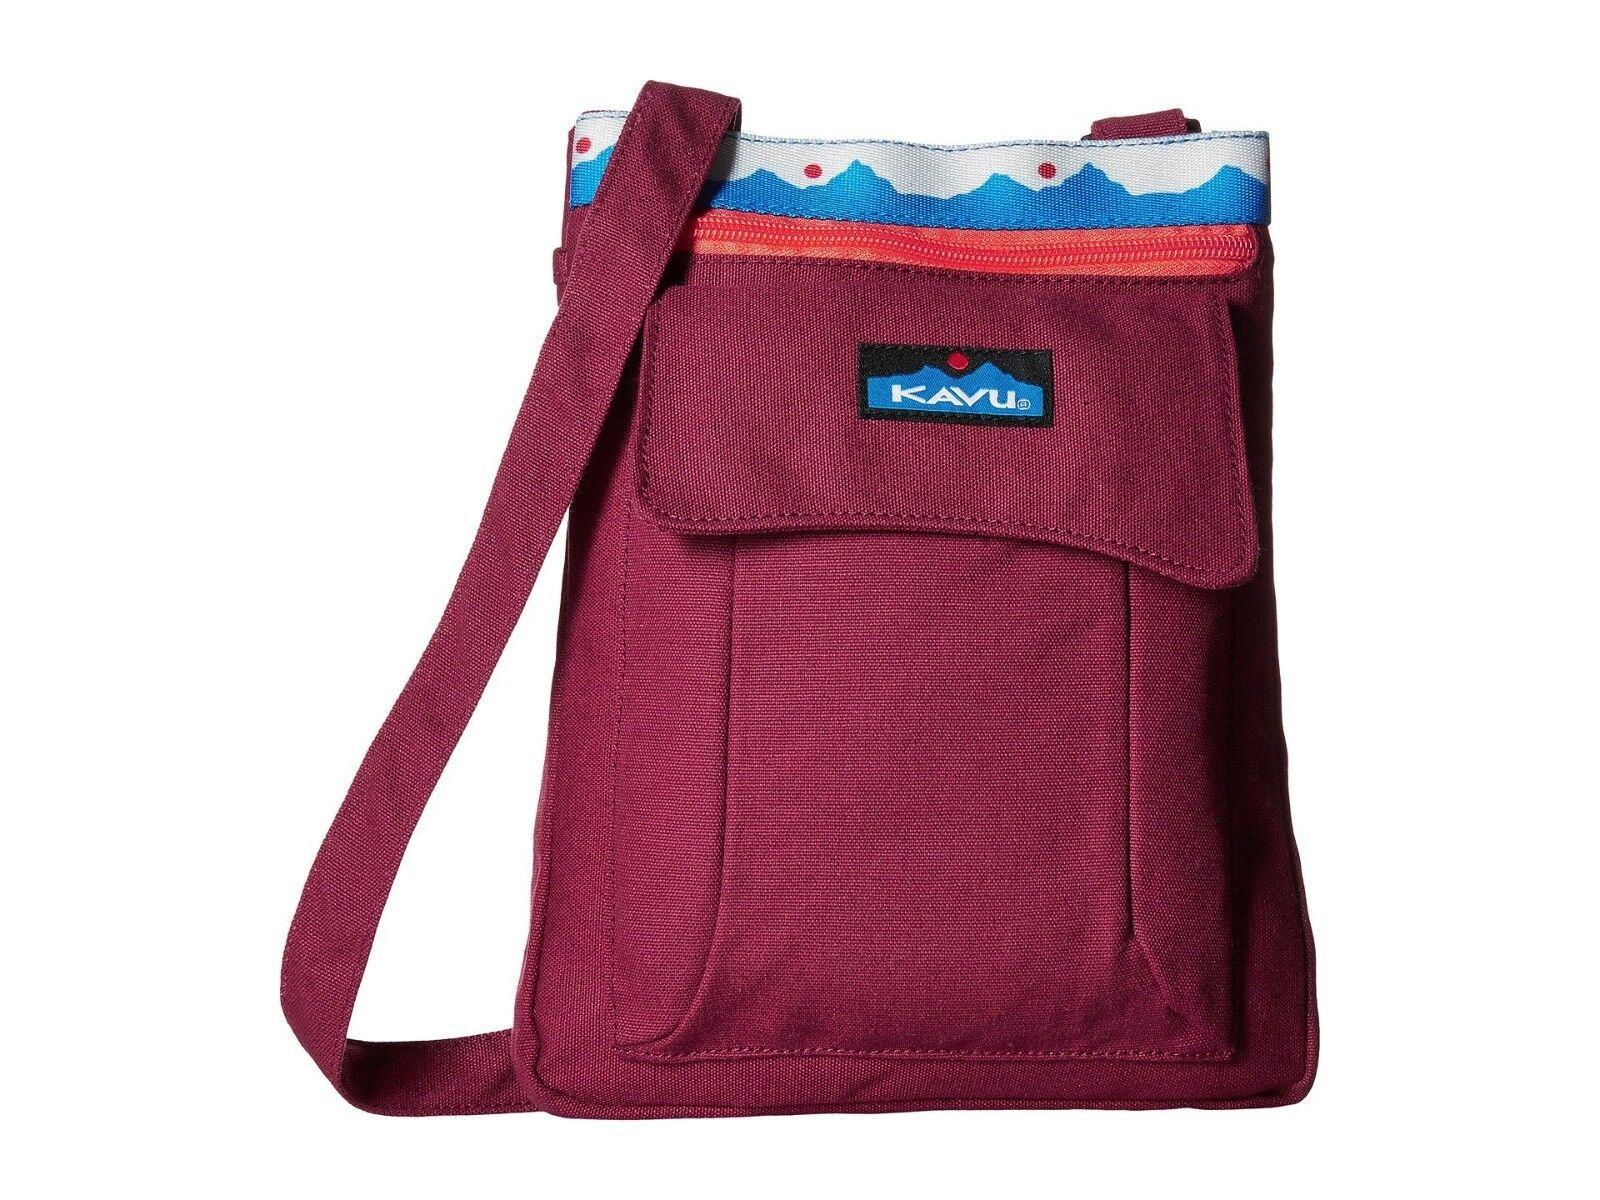 Kavu KEEPER BAG Shoulder Travel Canvas Crossbody Bag Purse R